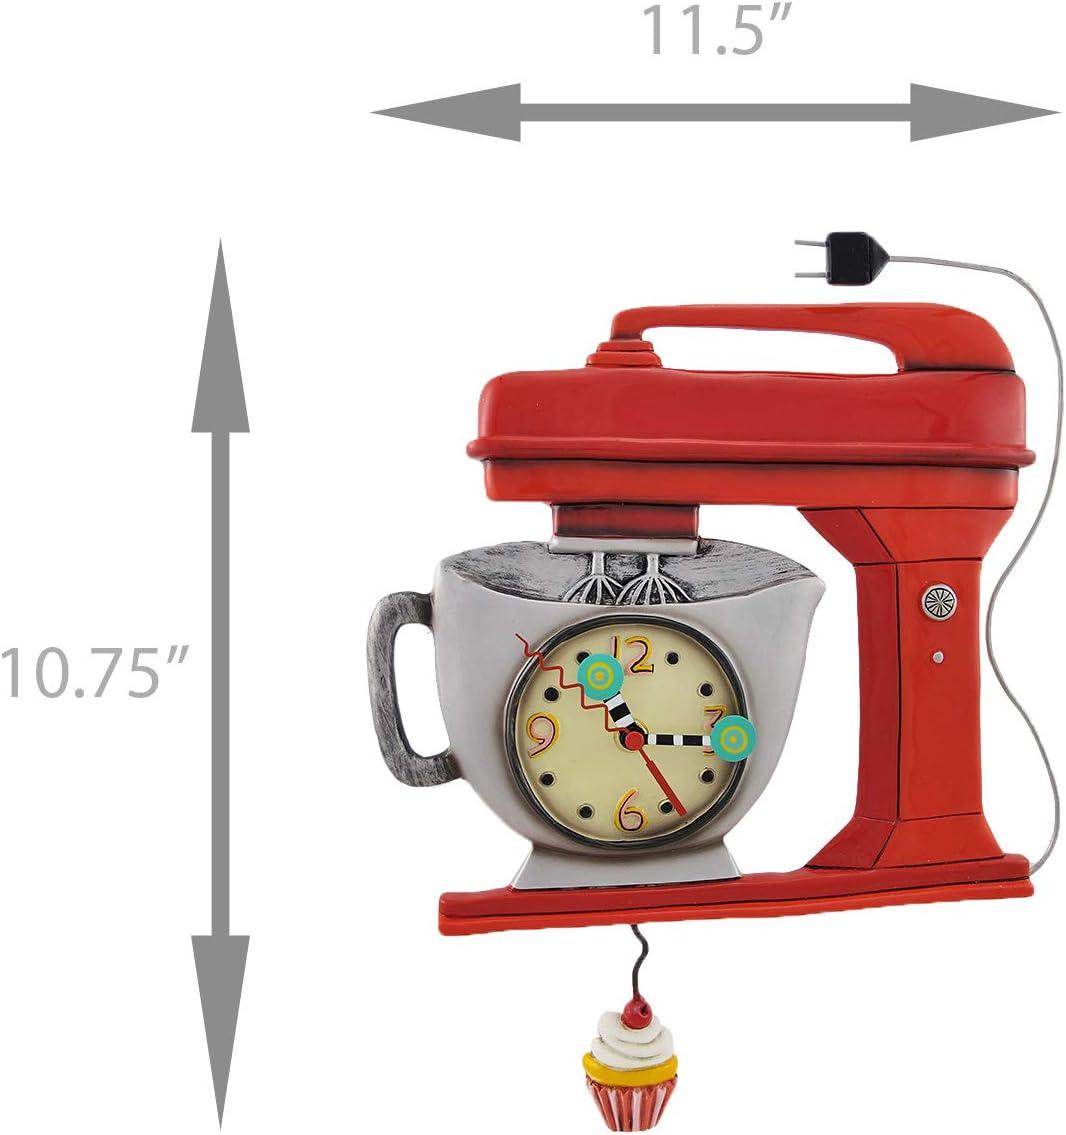 Allen Design Studios Vintage Mixer Green Mixer Kitchen Wall Clock